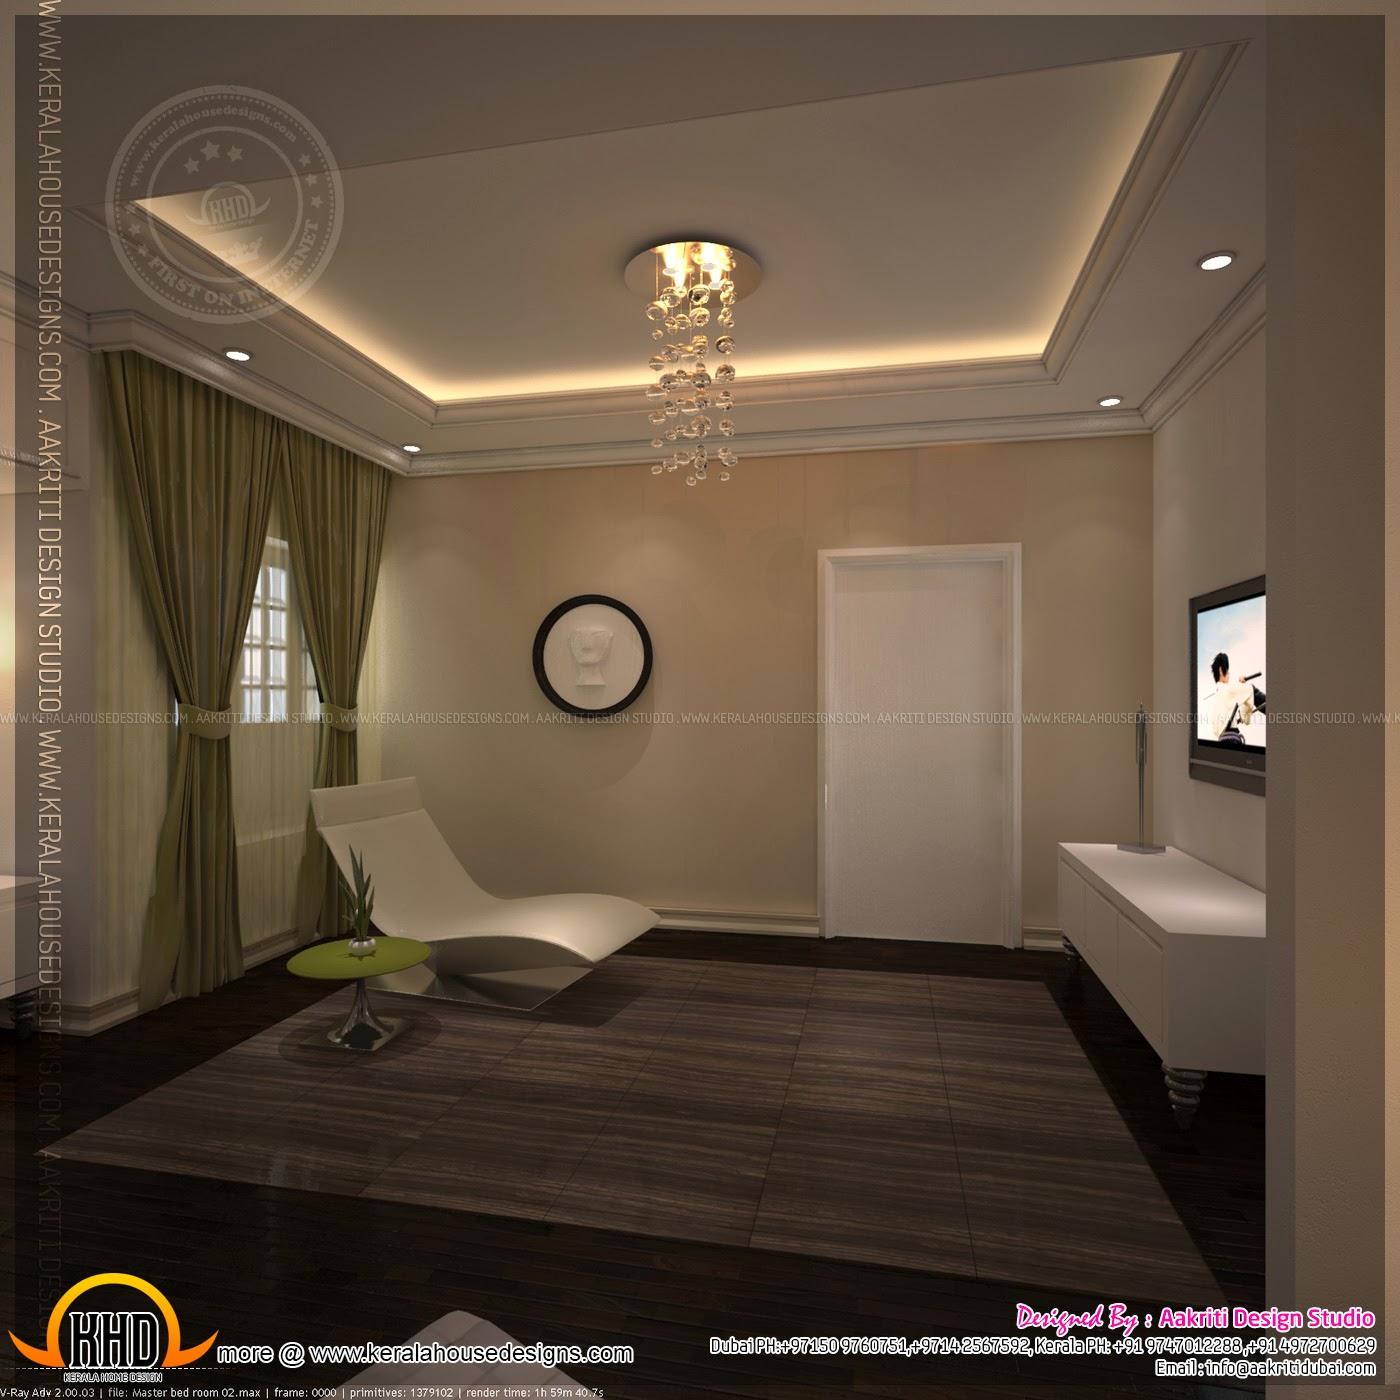 Master bedroom and bathroom interior design